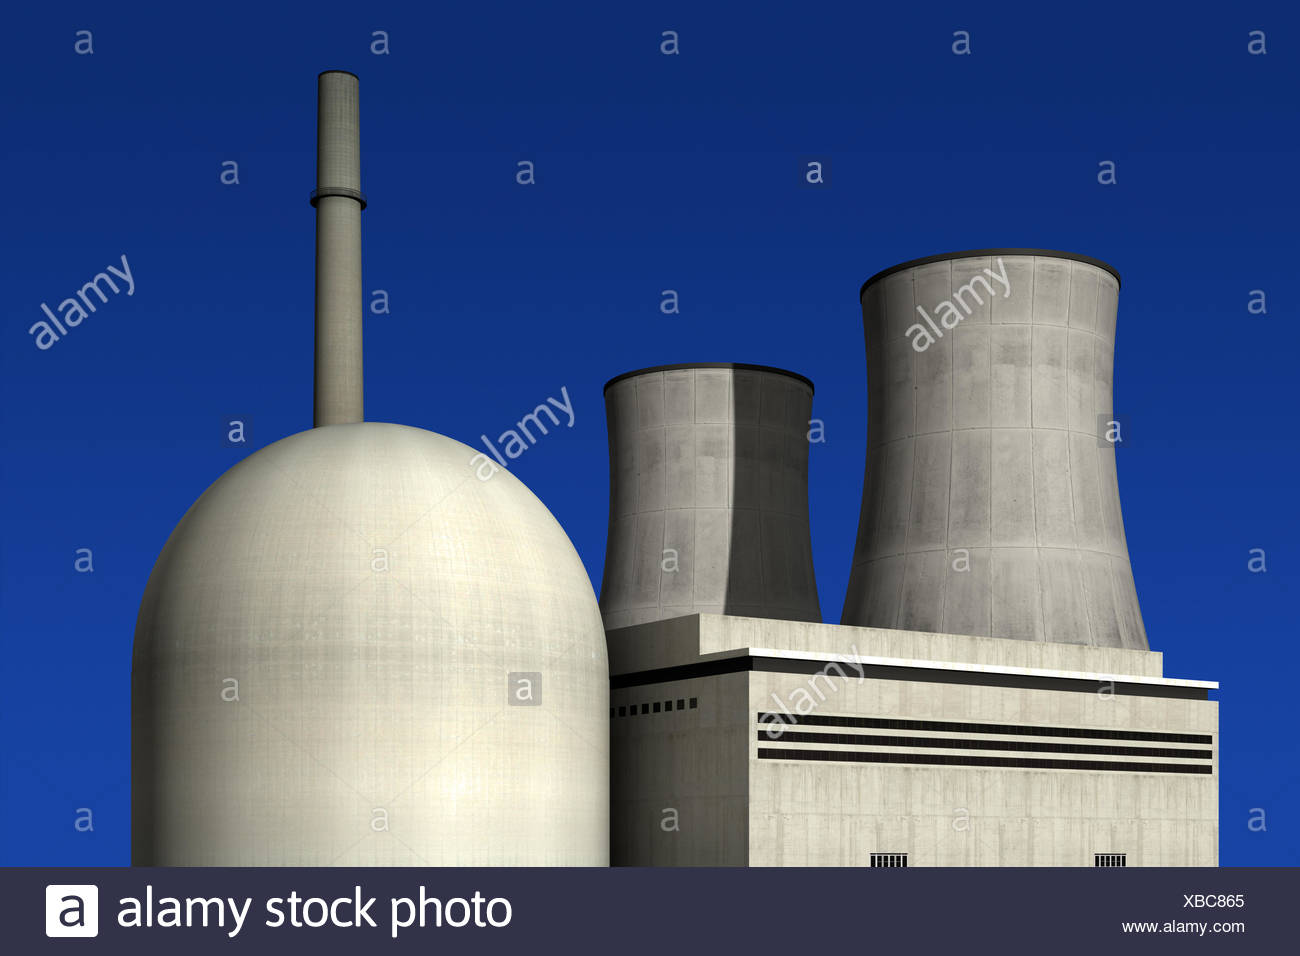 frowningly menacing threat radiation deterring blue danger frowningly menacing Stock Photo